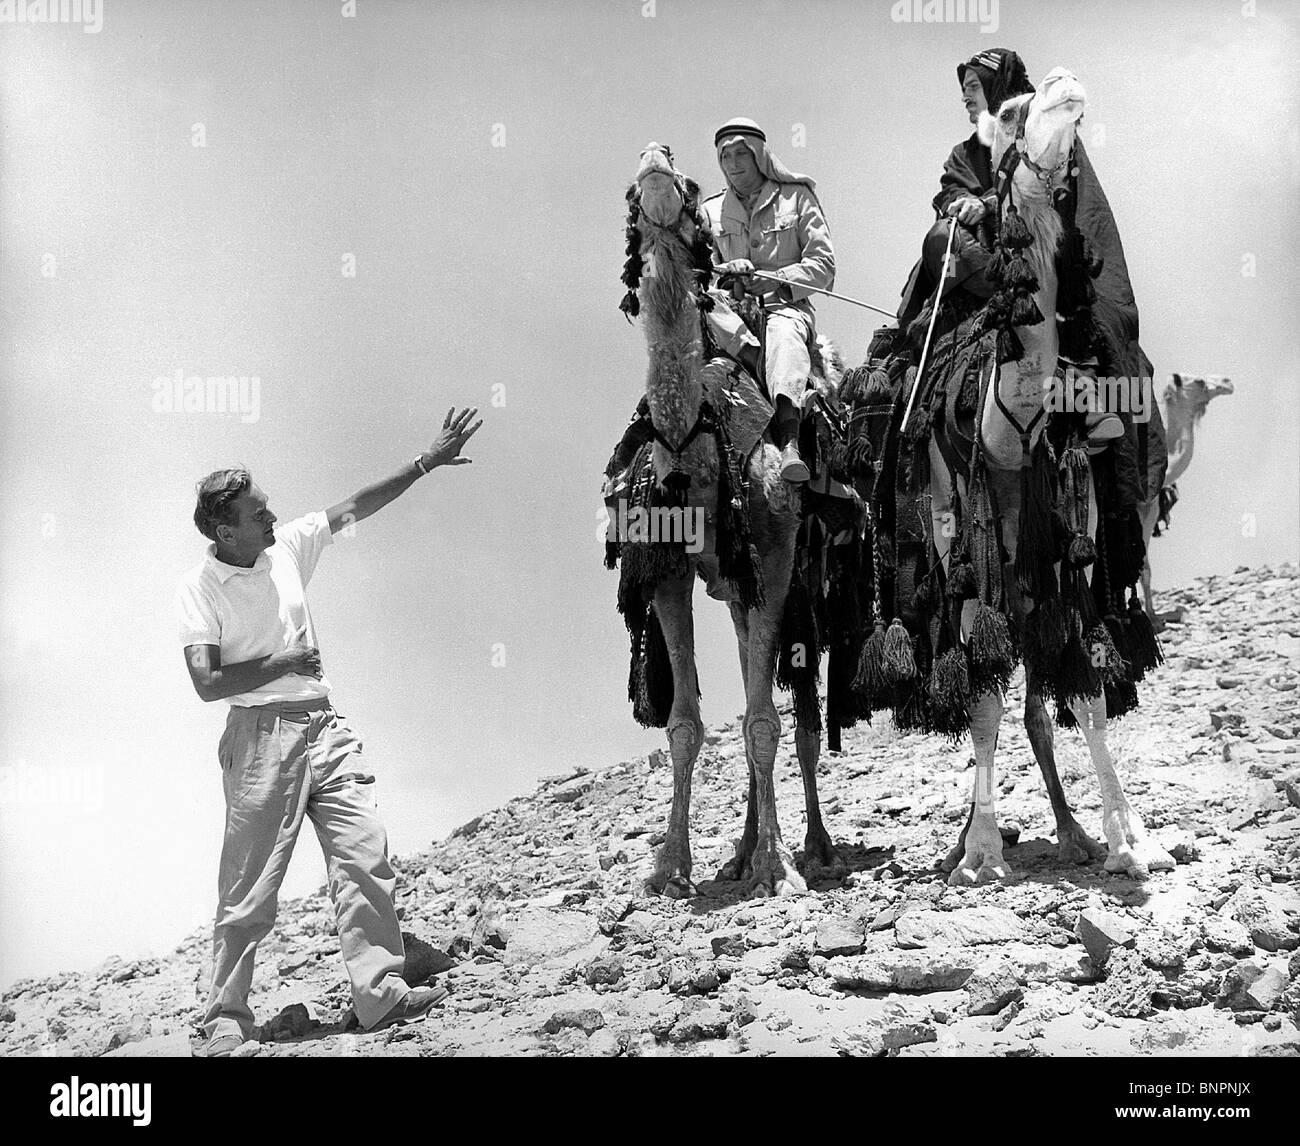 Lawrence Of Arabia David Lean: DAVID LEAN PETER O'TOOLE & OMAR SHARIF LAWRENCE OF ARABIA